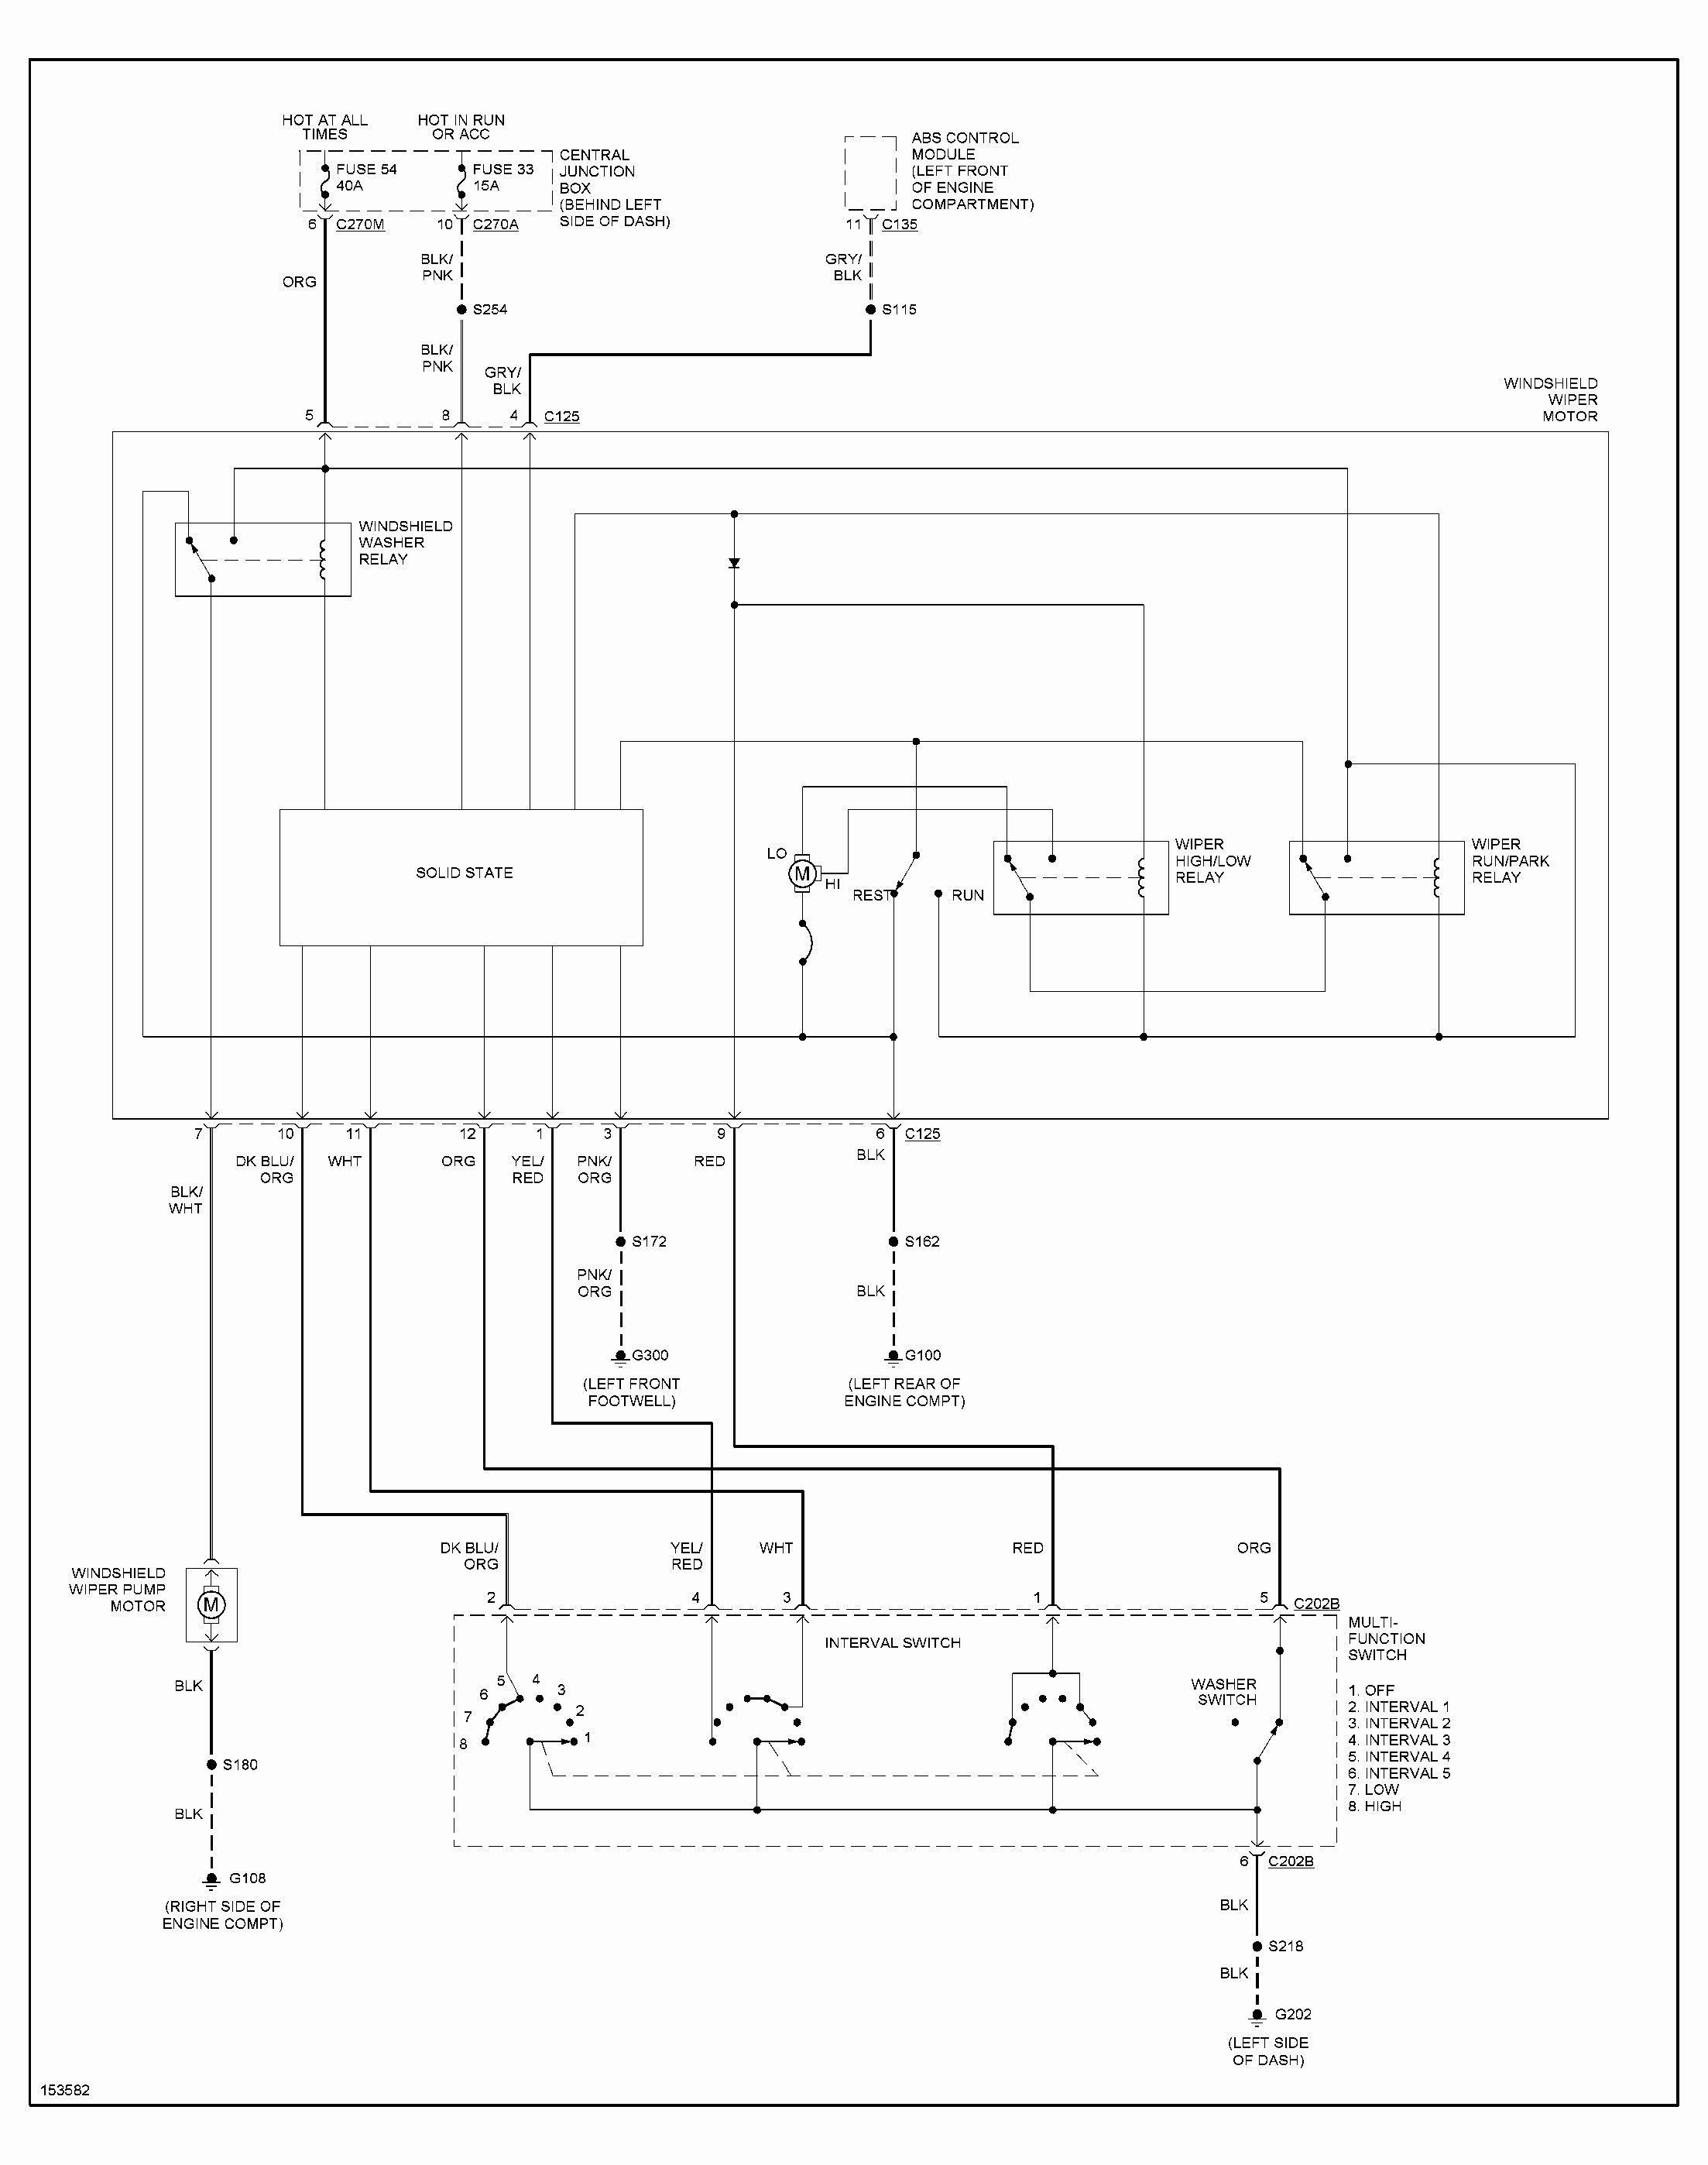 Unique Citroen Dispatch Glow Plug Relay Wiring Diagram Diagram Diagramsample Diagramtemplate Check More At Https Morni Ford Focus Engine Diagram Ford F650